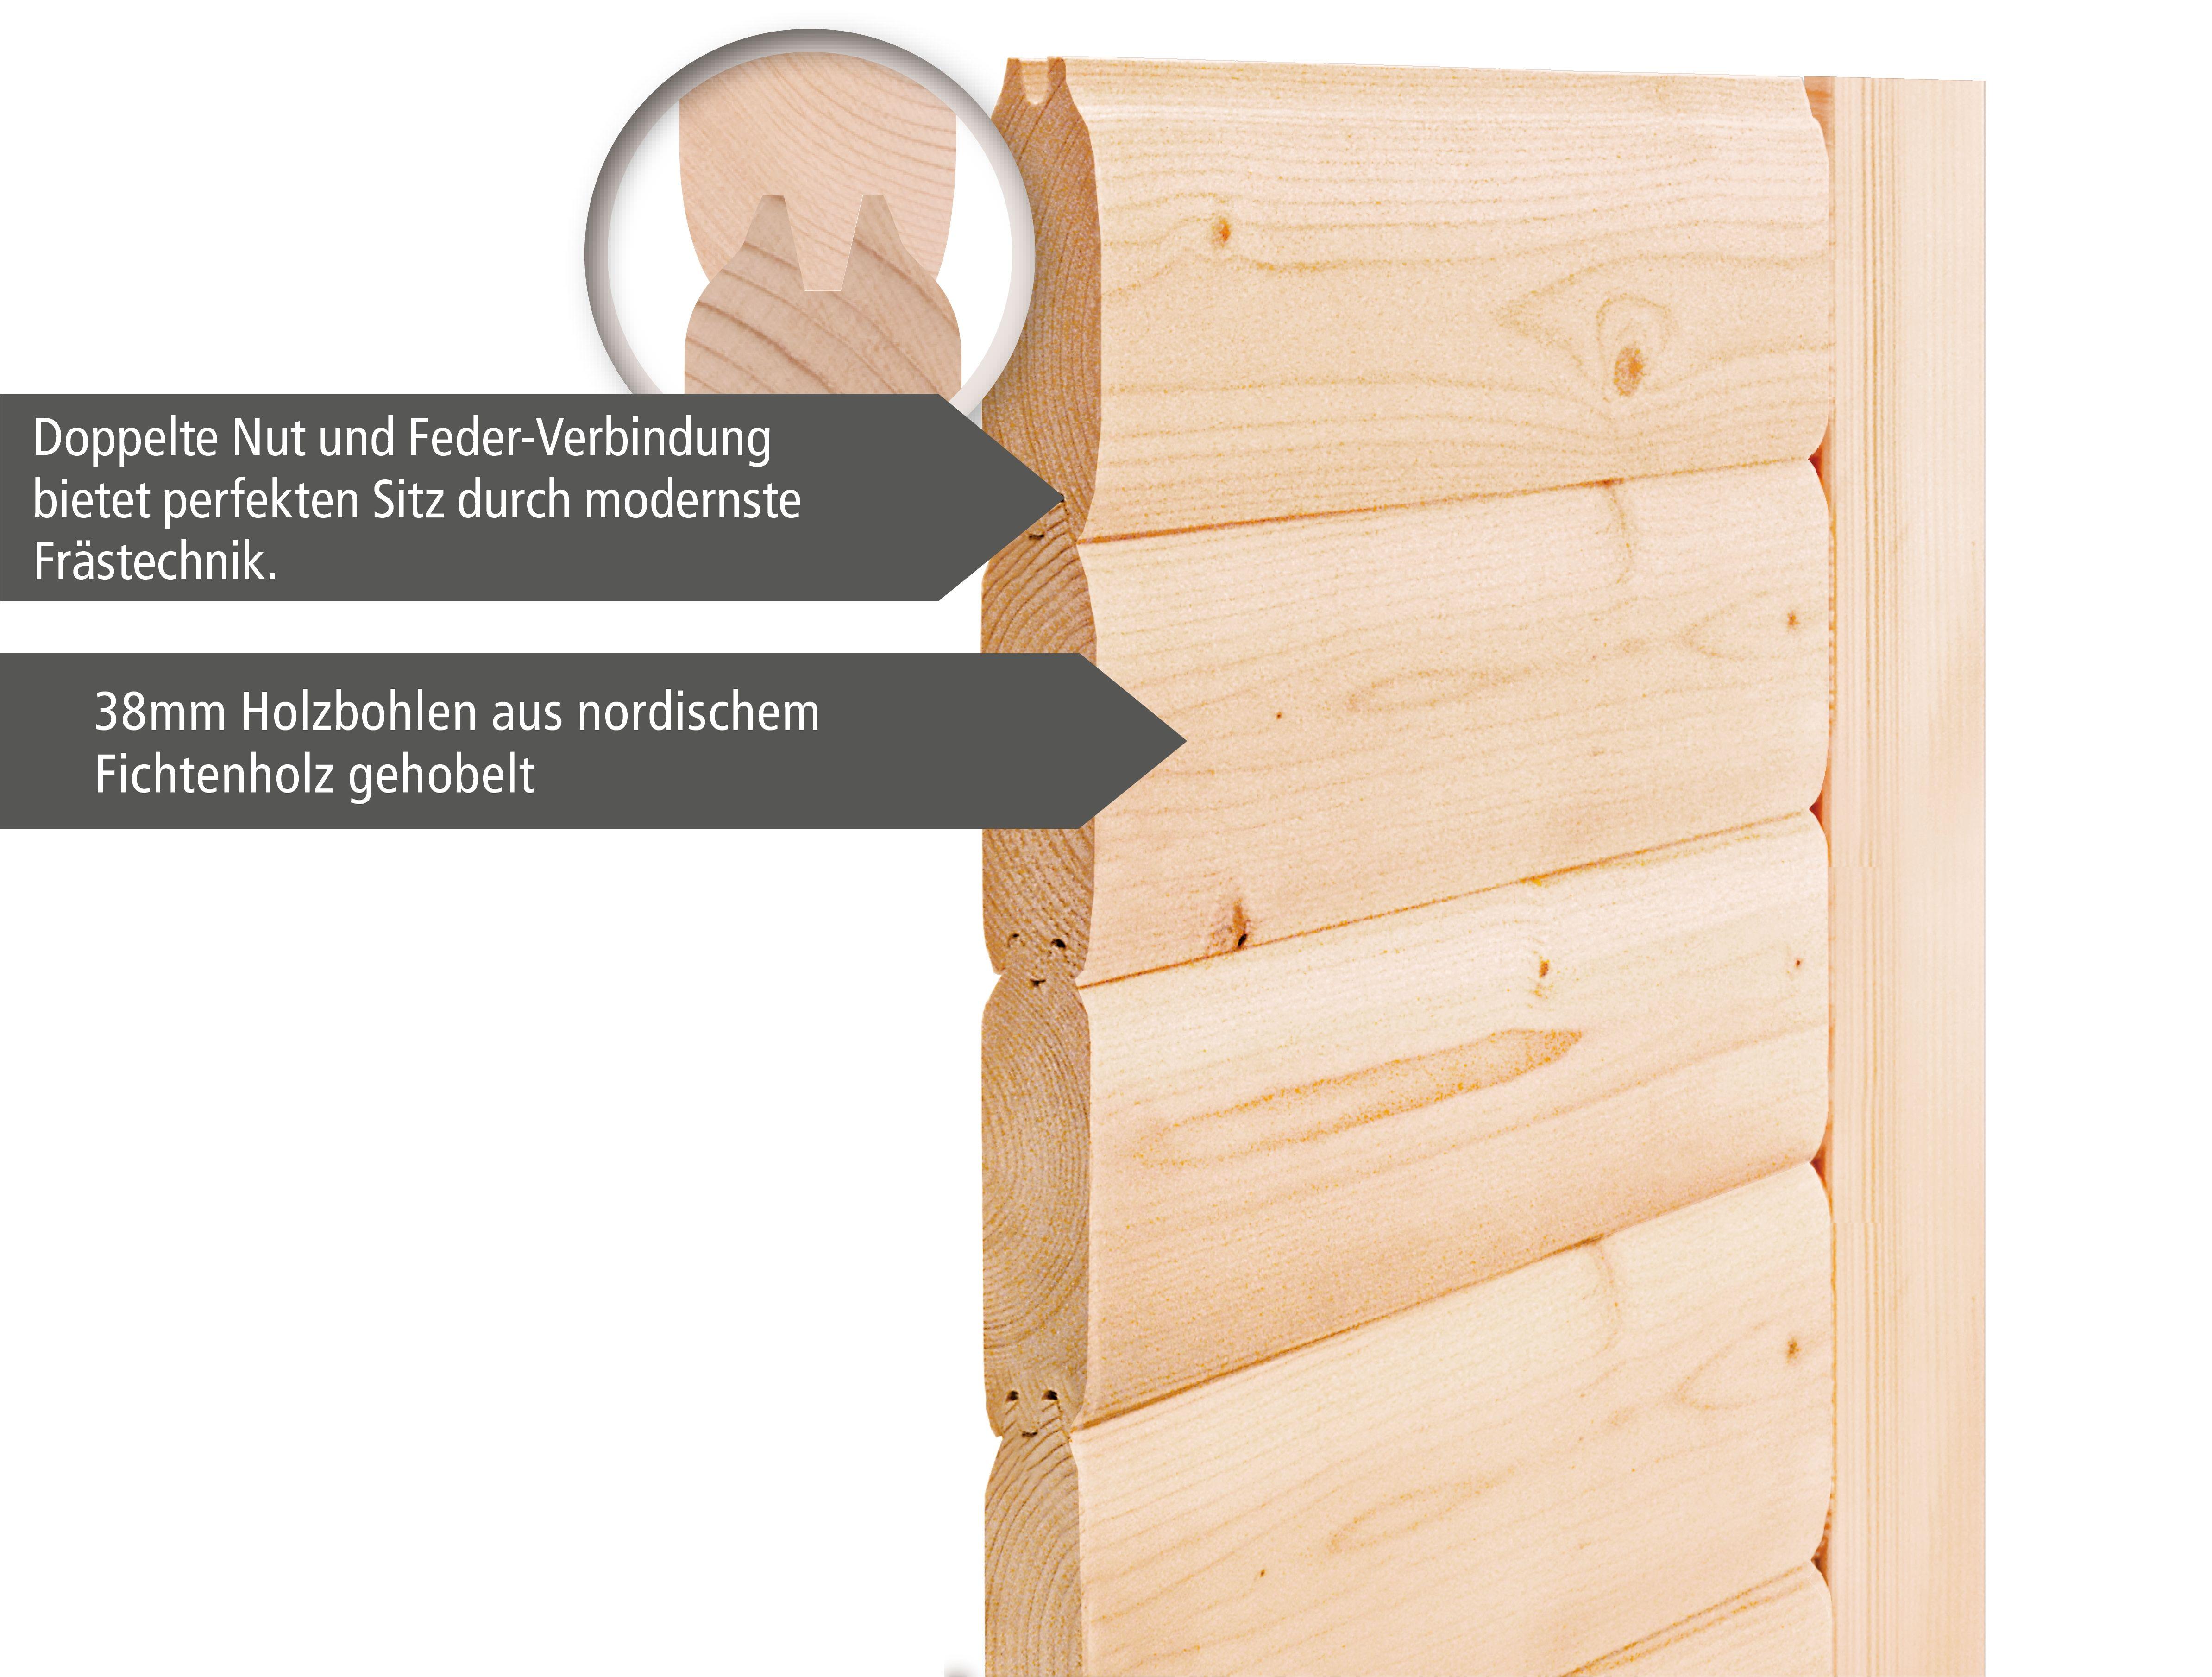 Woodfeeling Sauna Tabea 38mm Dachkranz Saunaofen 9 kW intern Bild 9